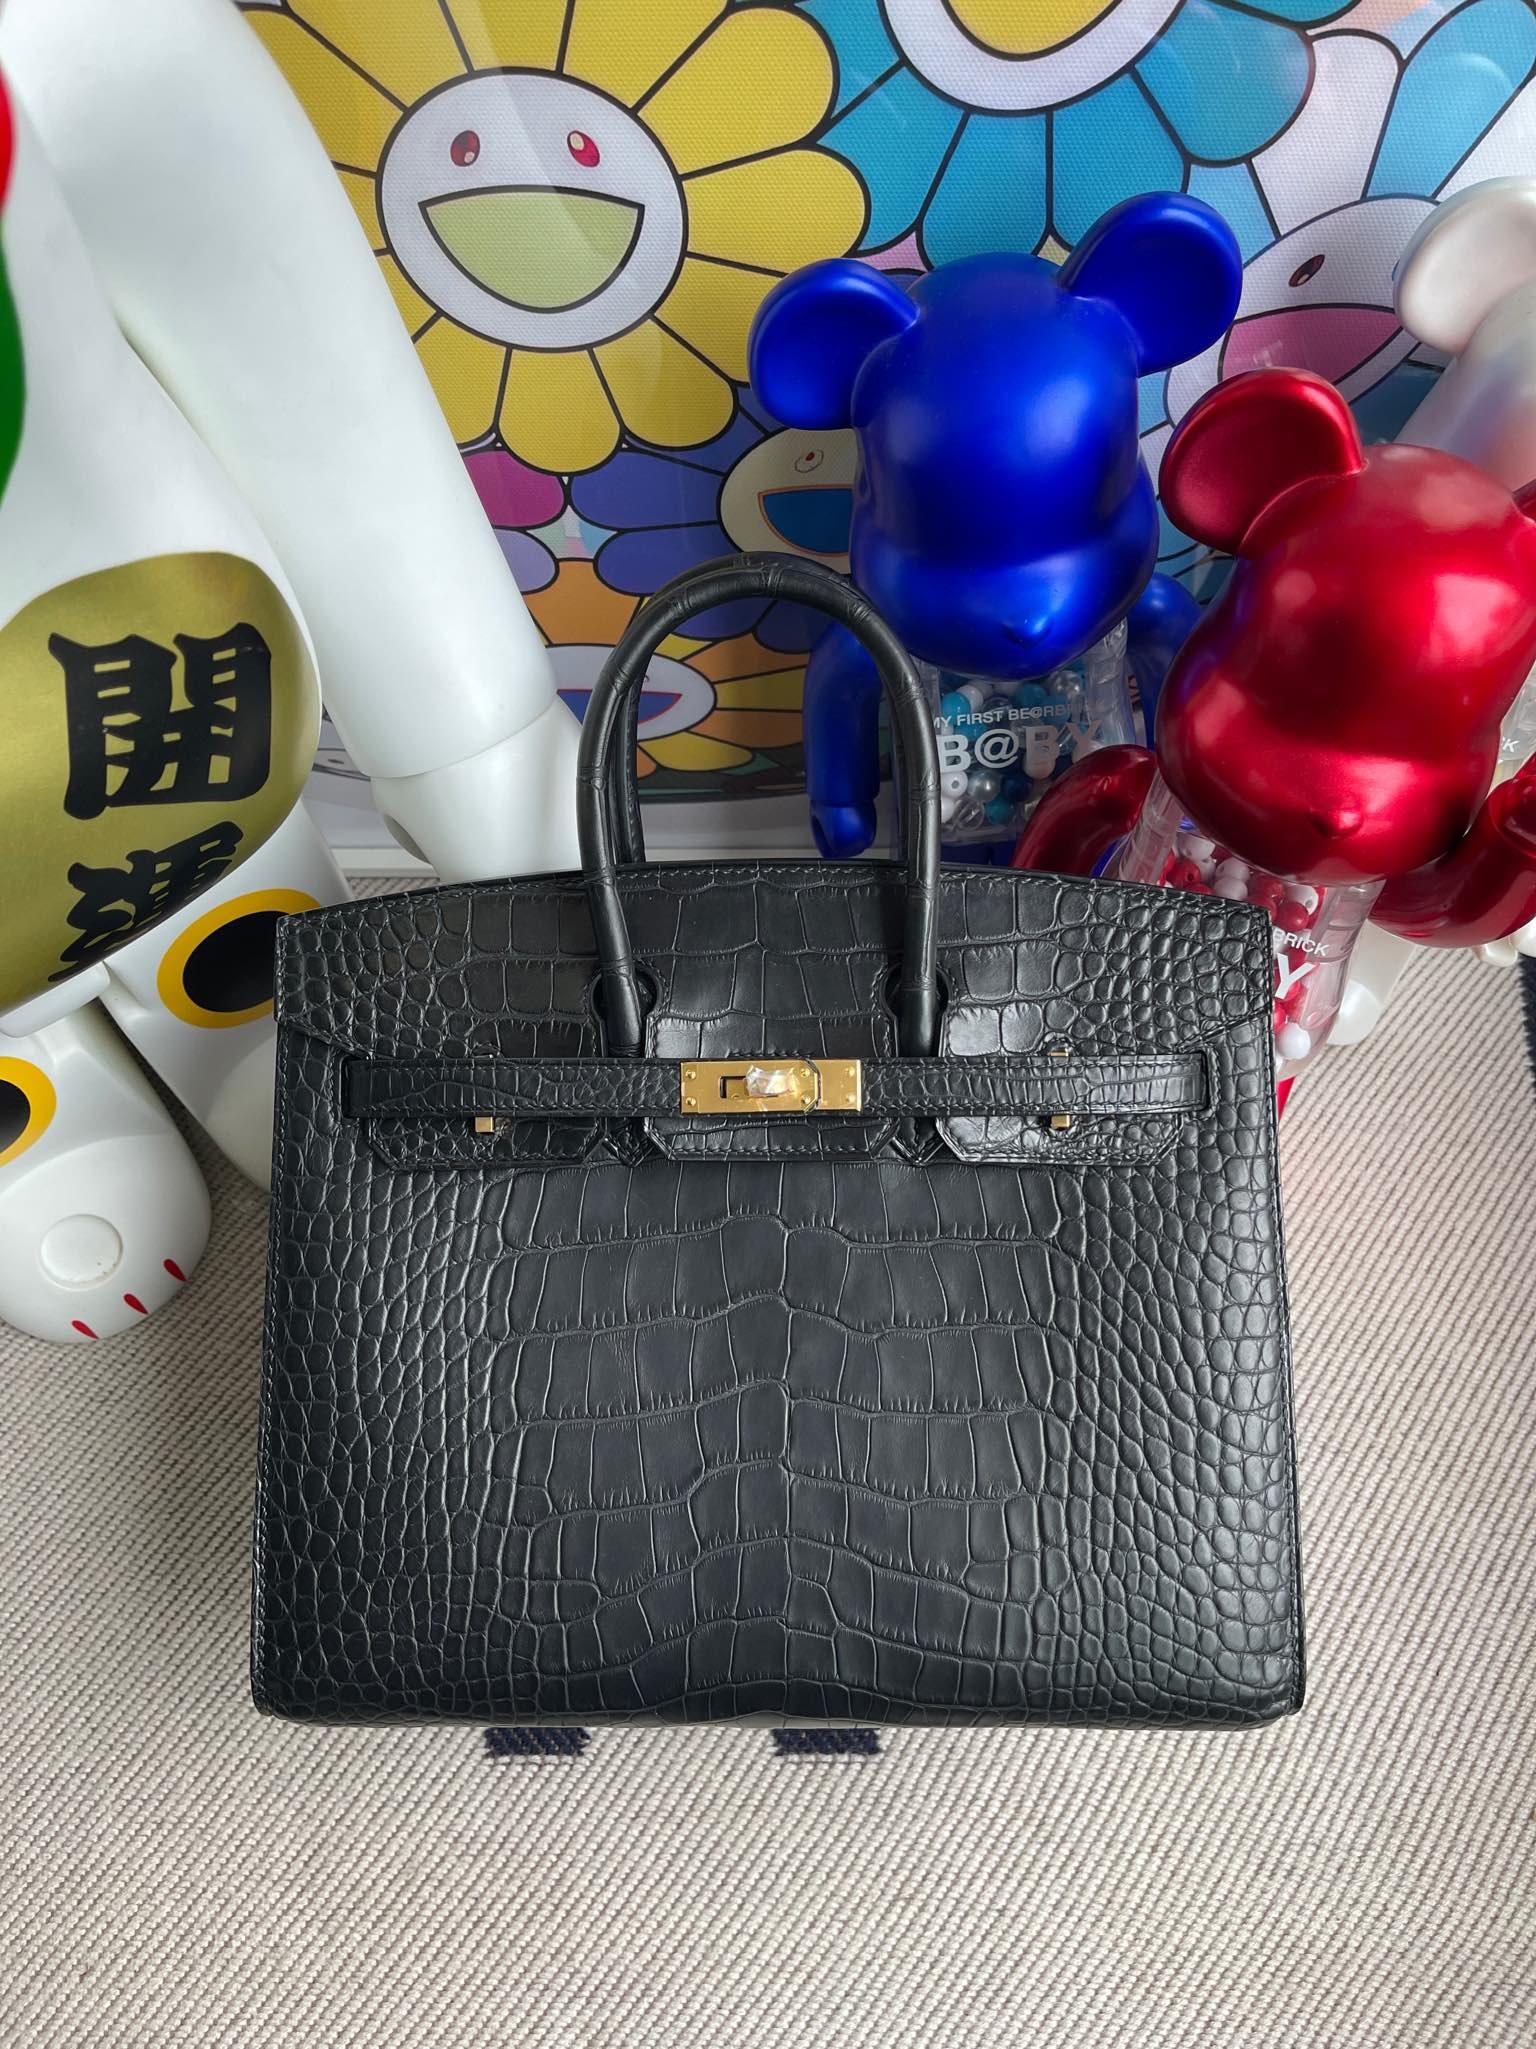 Hermès(爱马仕)Birkin 铂金包 Alligator matt 雾面鳄 ck89 黑色 noir 外缝 25cm 顶级手缝